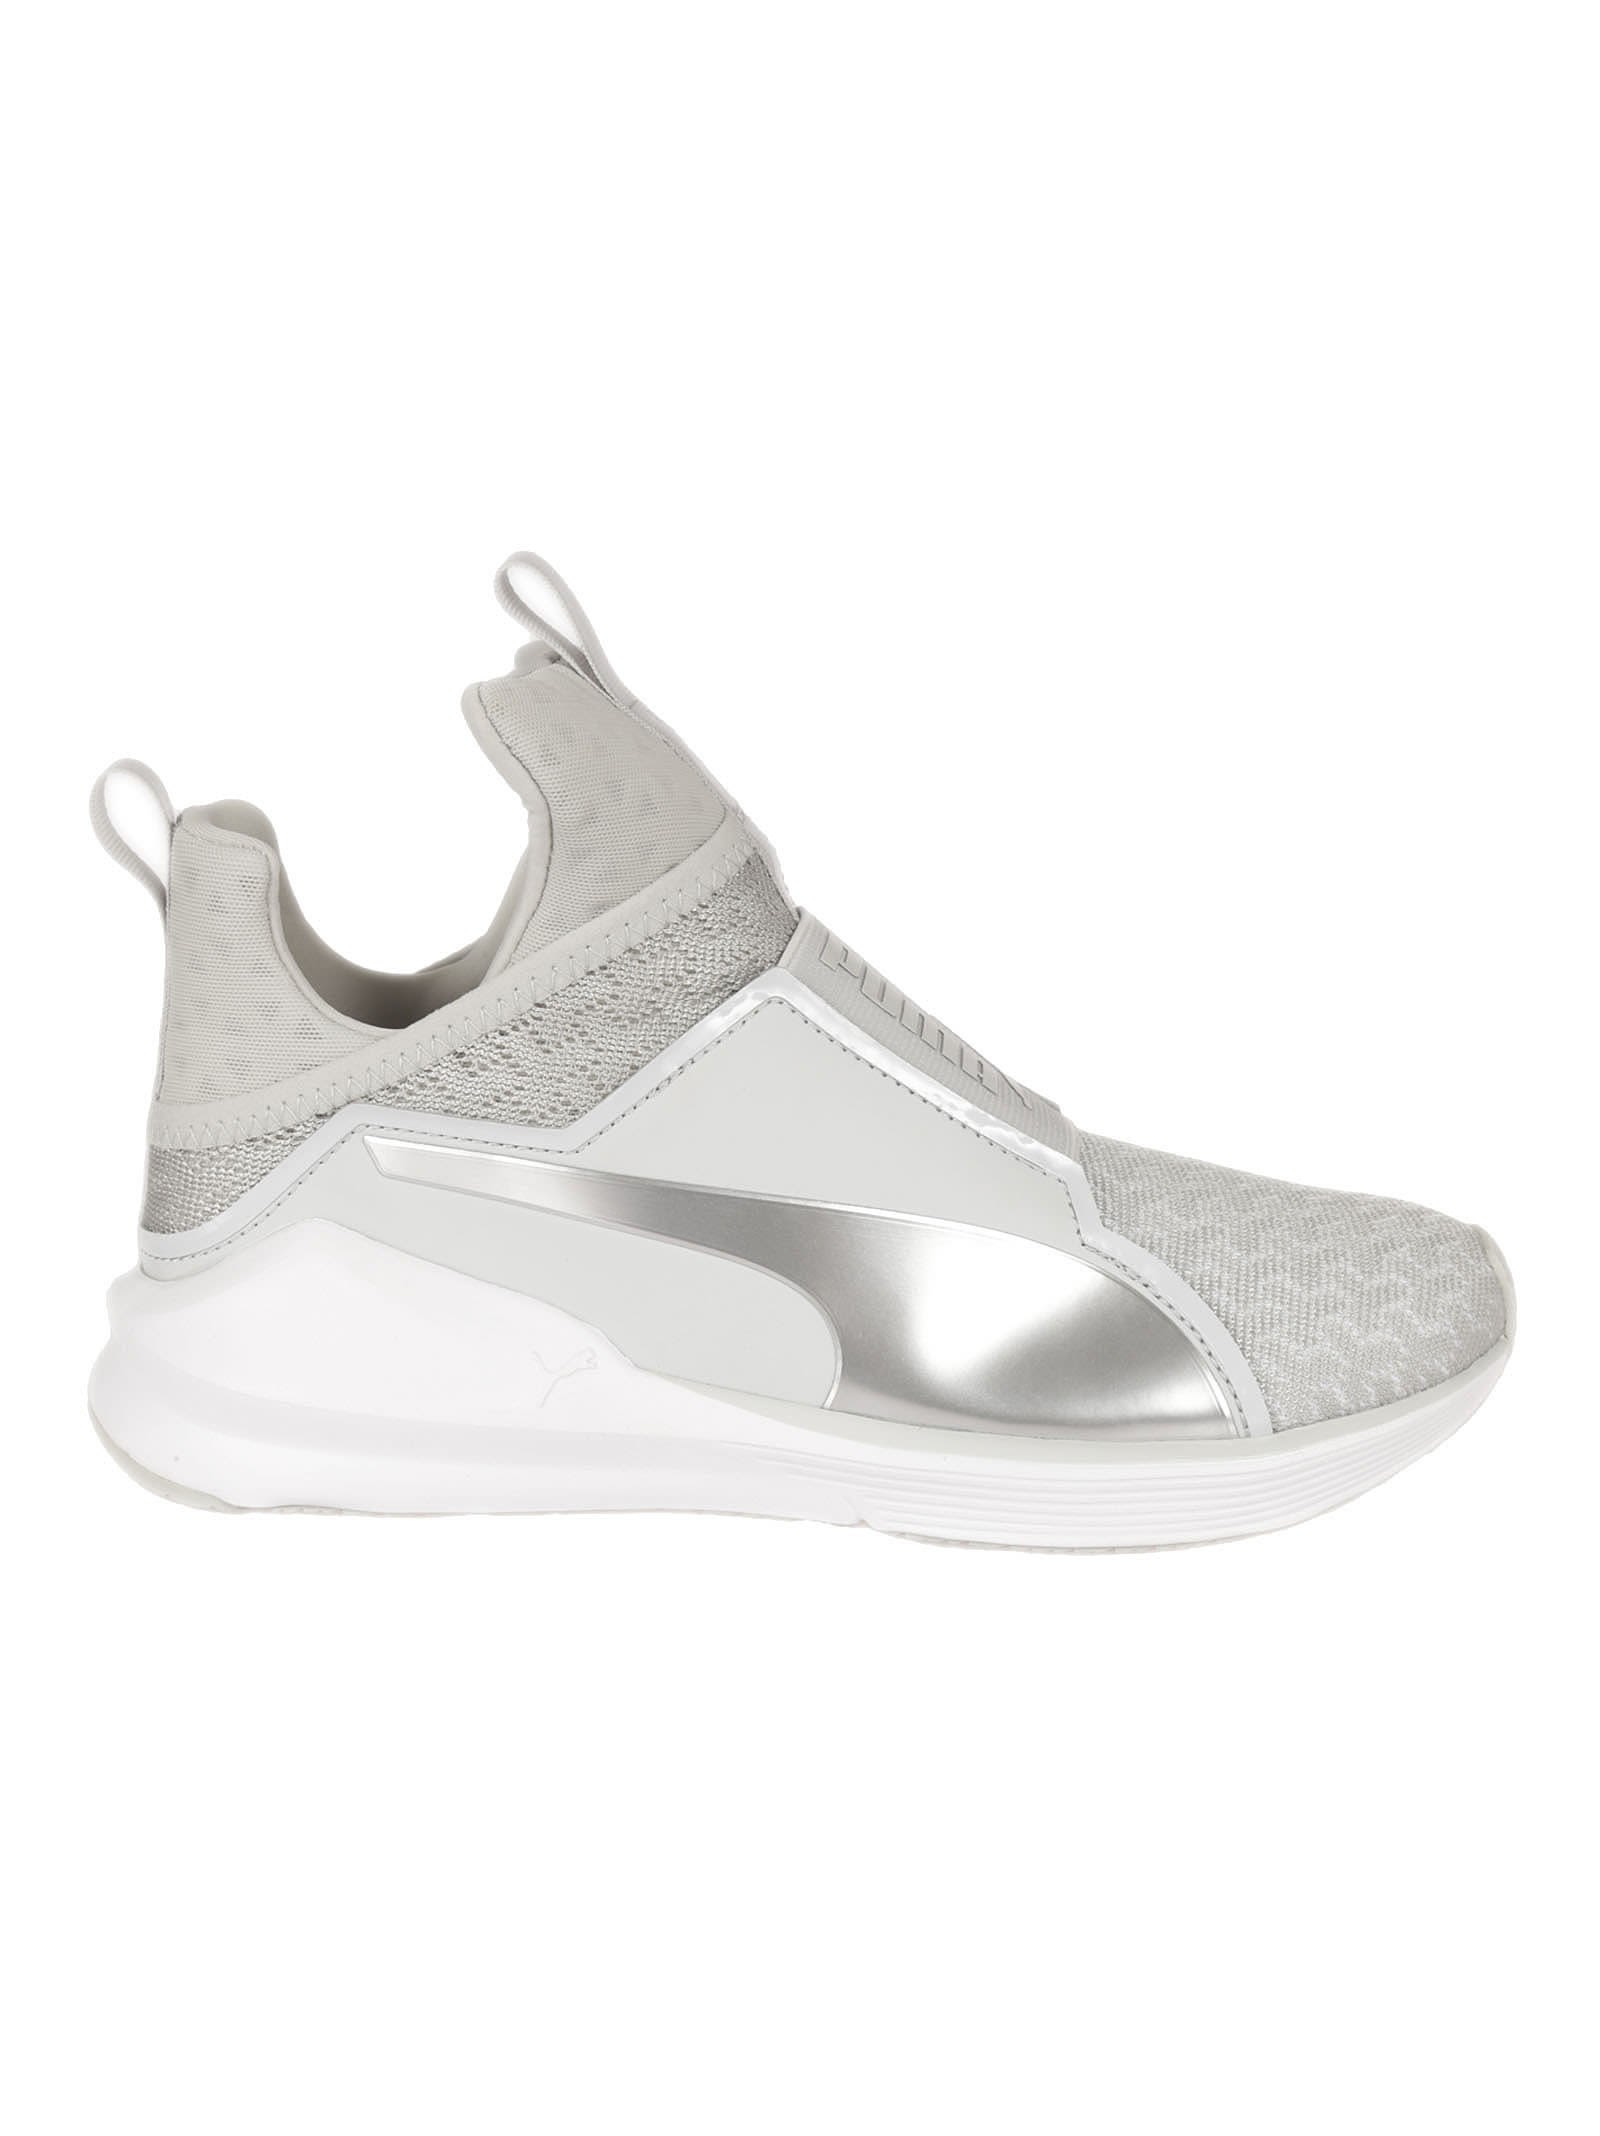 Puma Light Grey Fierce Mesh Sneakers